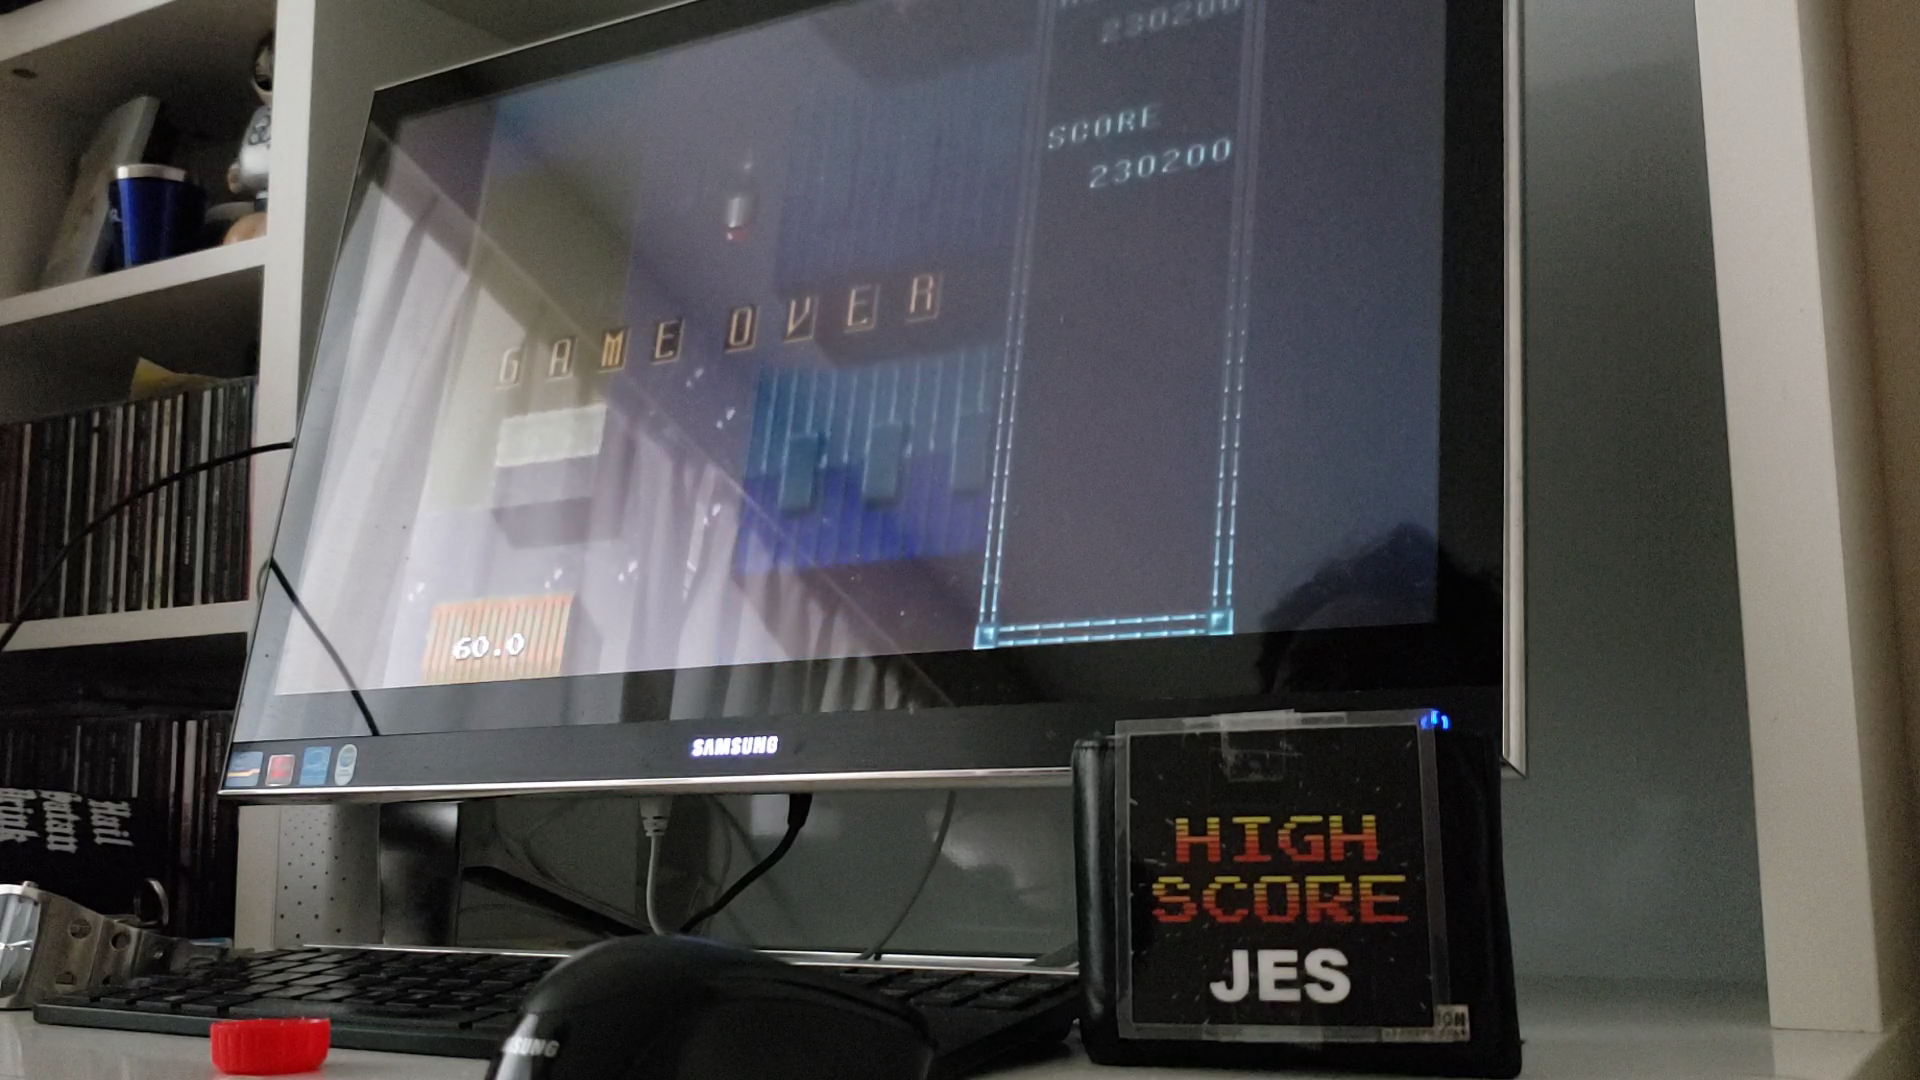 JES: Raiden Trad [Easy] (Sega Genesis / MegaDrive Emulated) 230,200 points on 2020-09-24 15:00:52